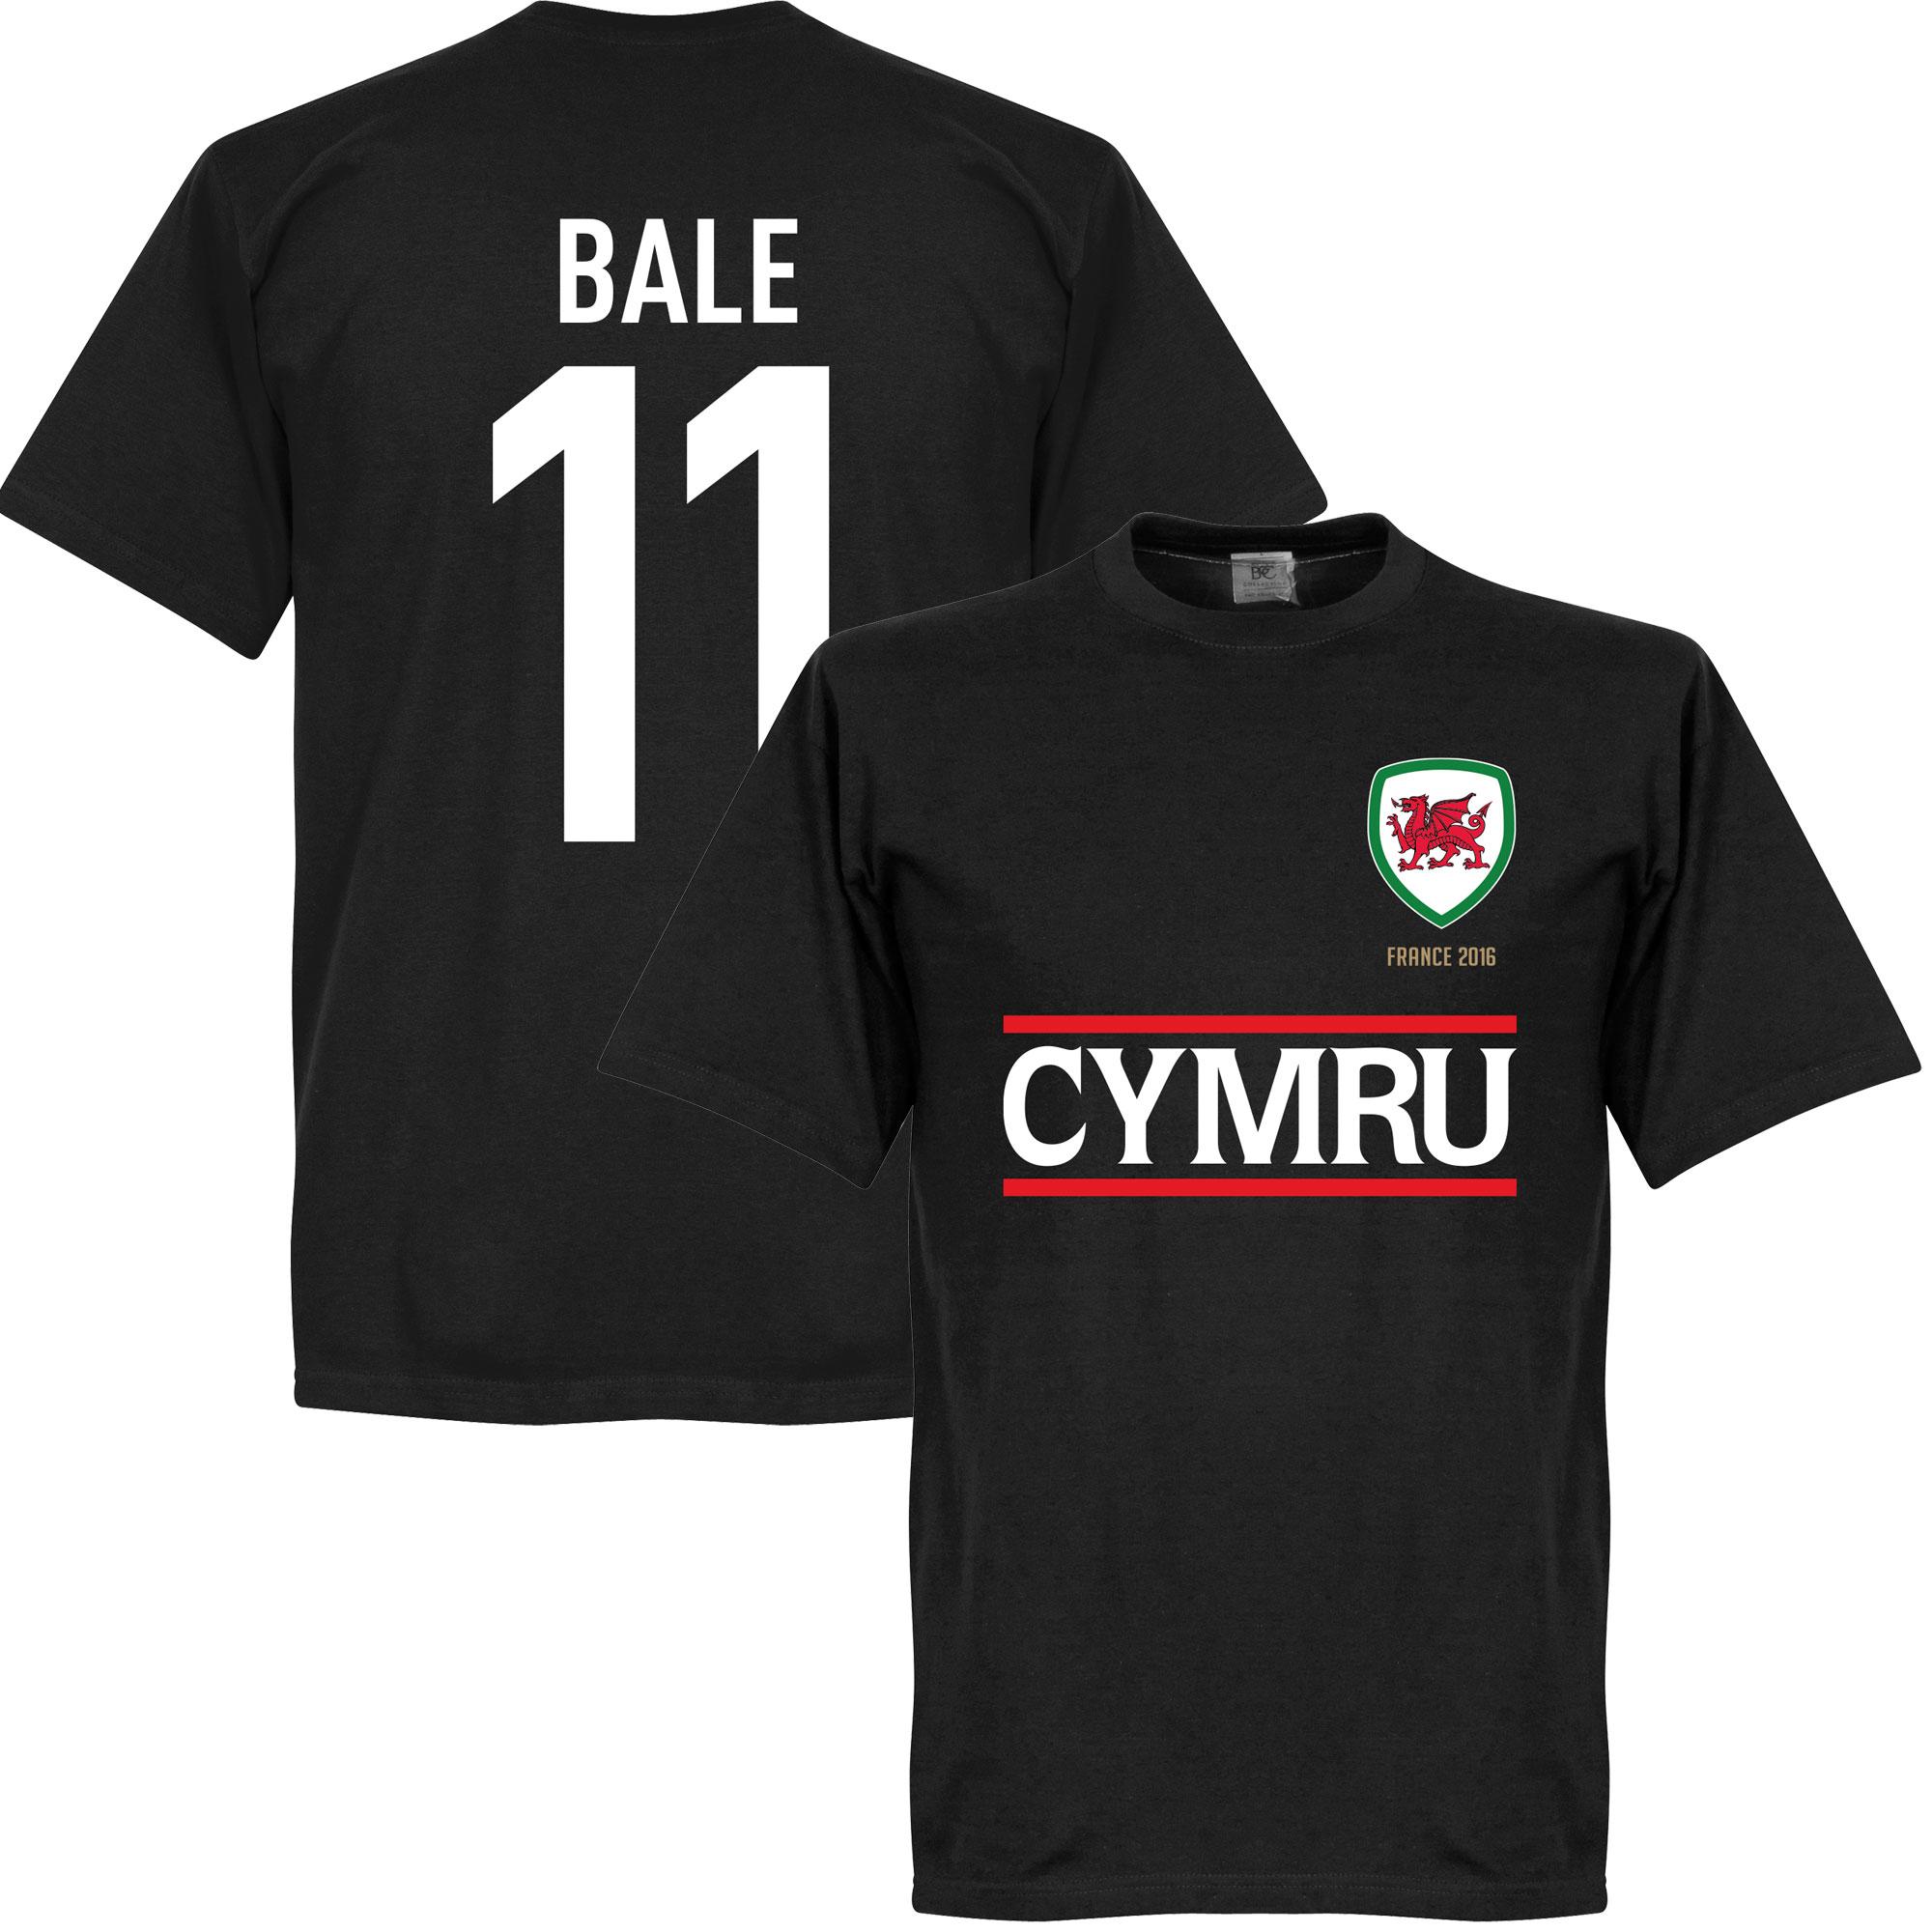 Cymru Bale Team Tee - Black - M